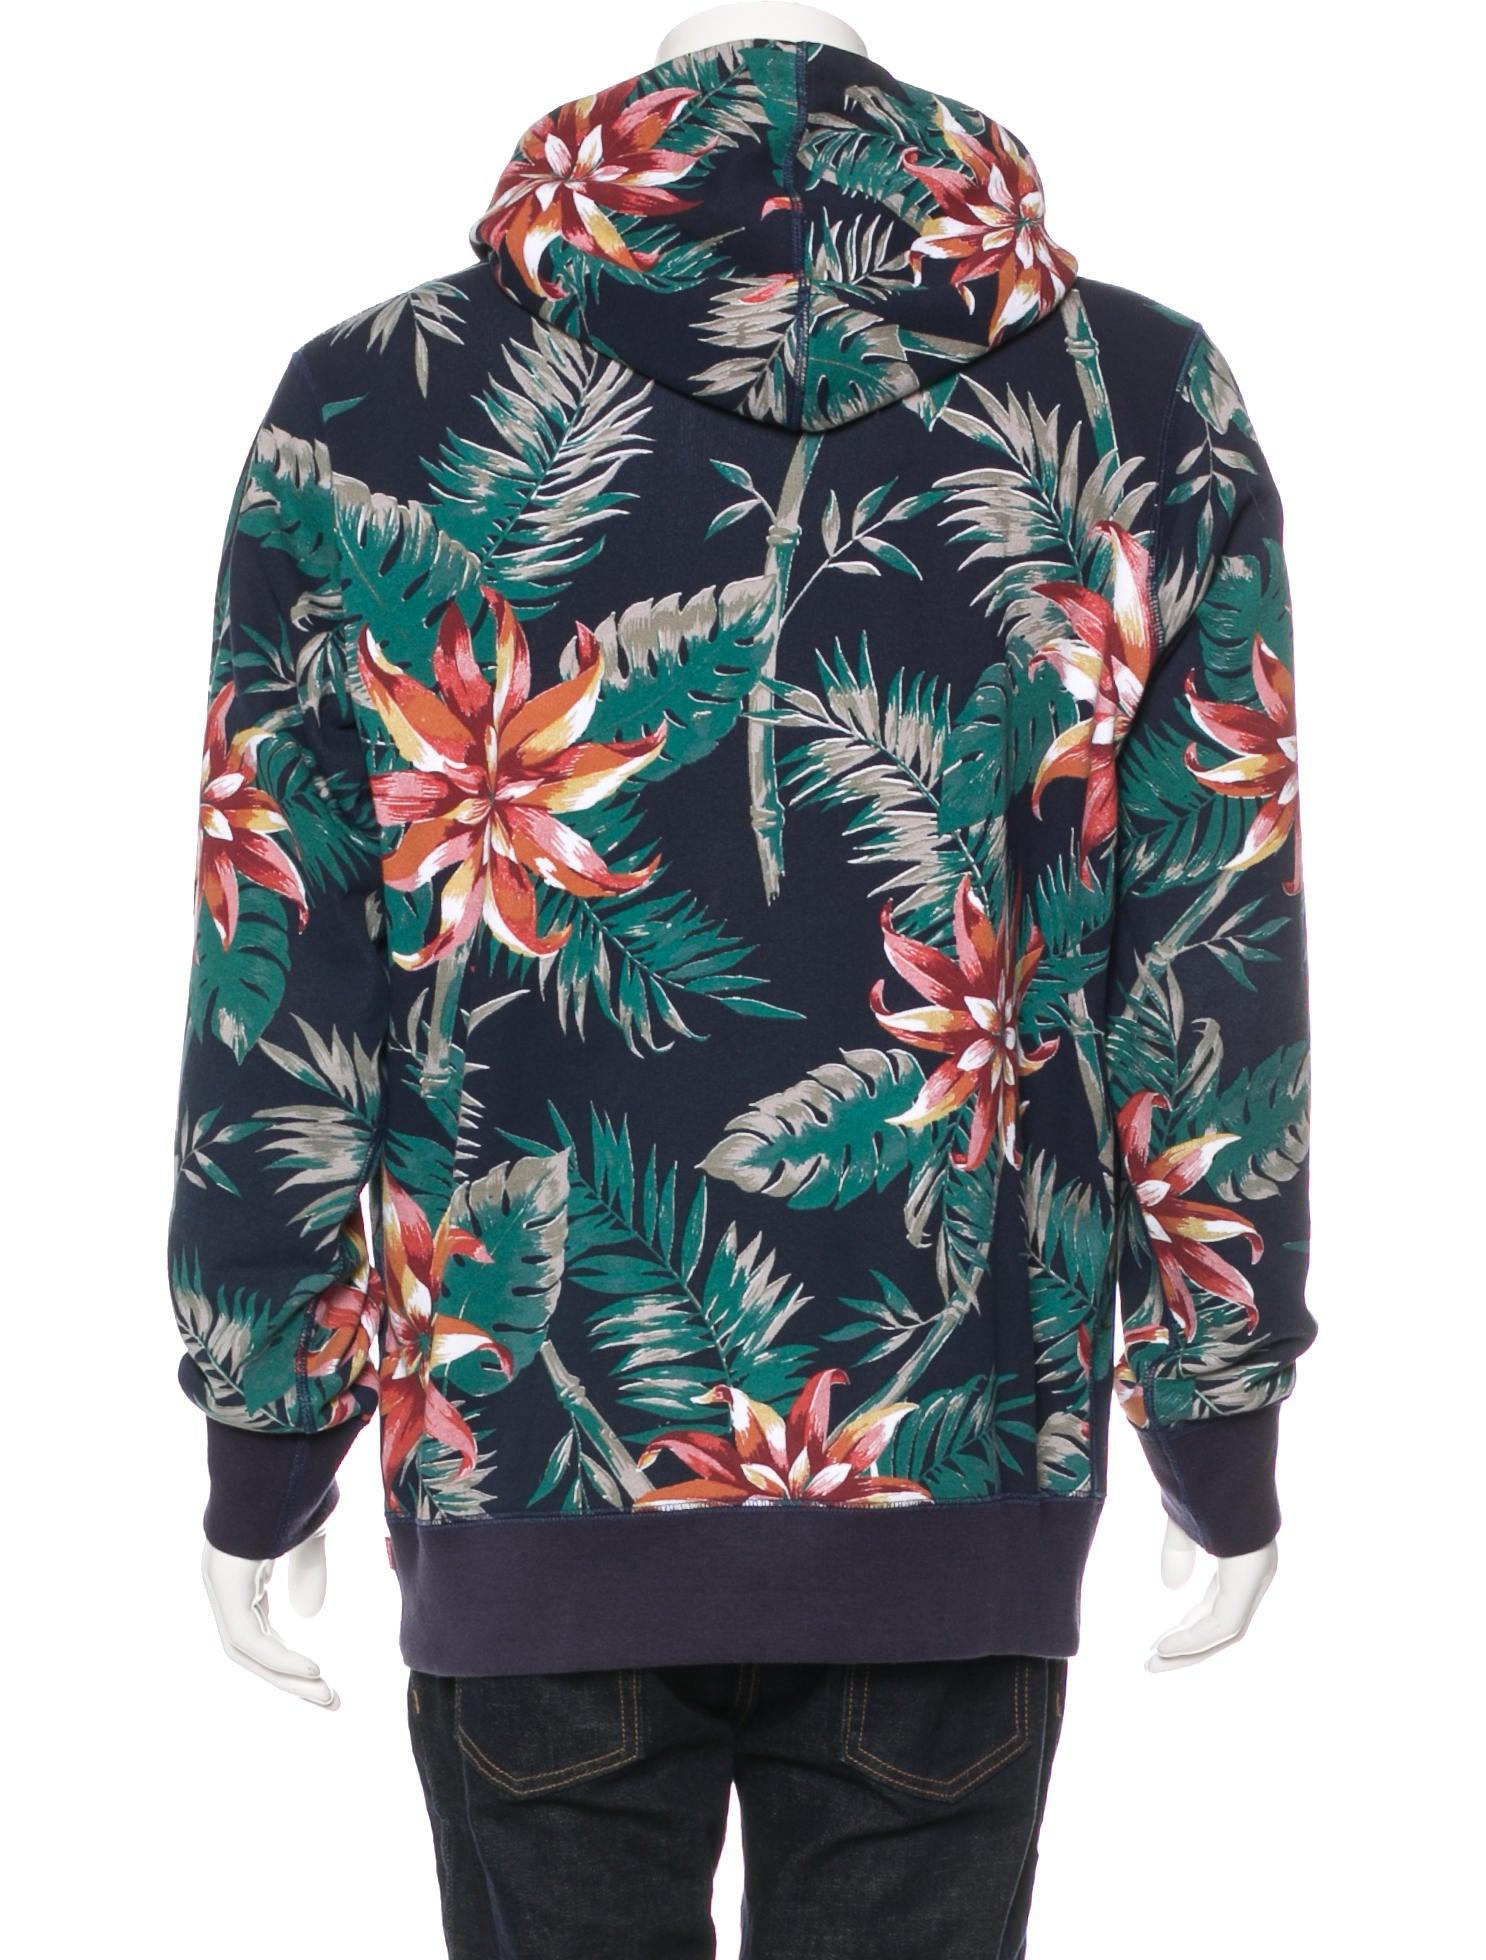 Supreme Floral Print Hoodie - Clothing - WSPME21412   The ...